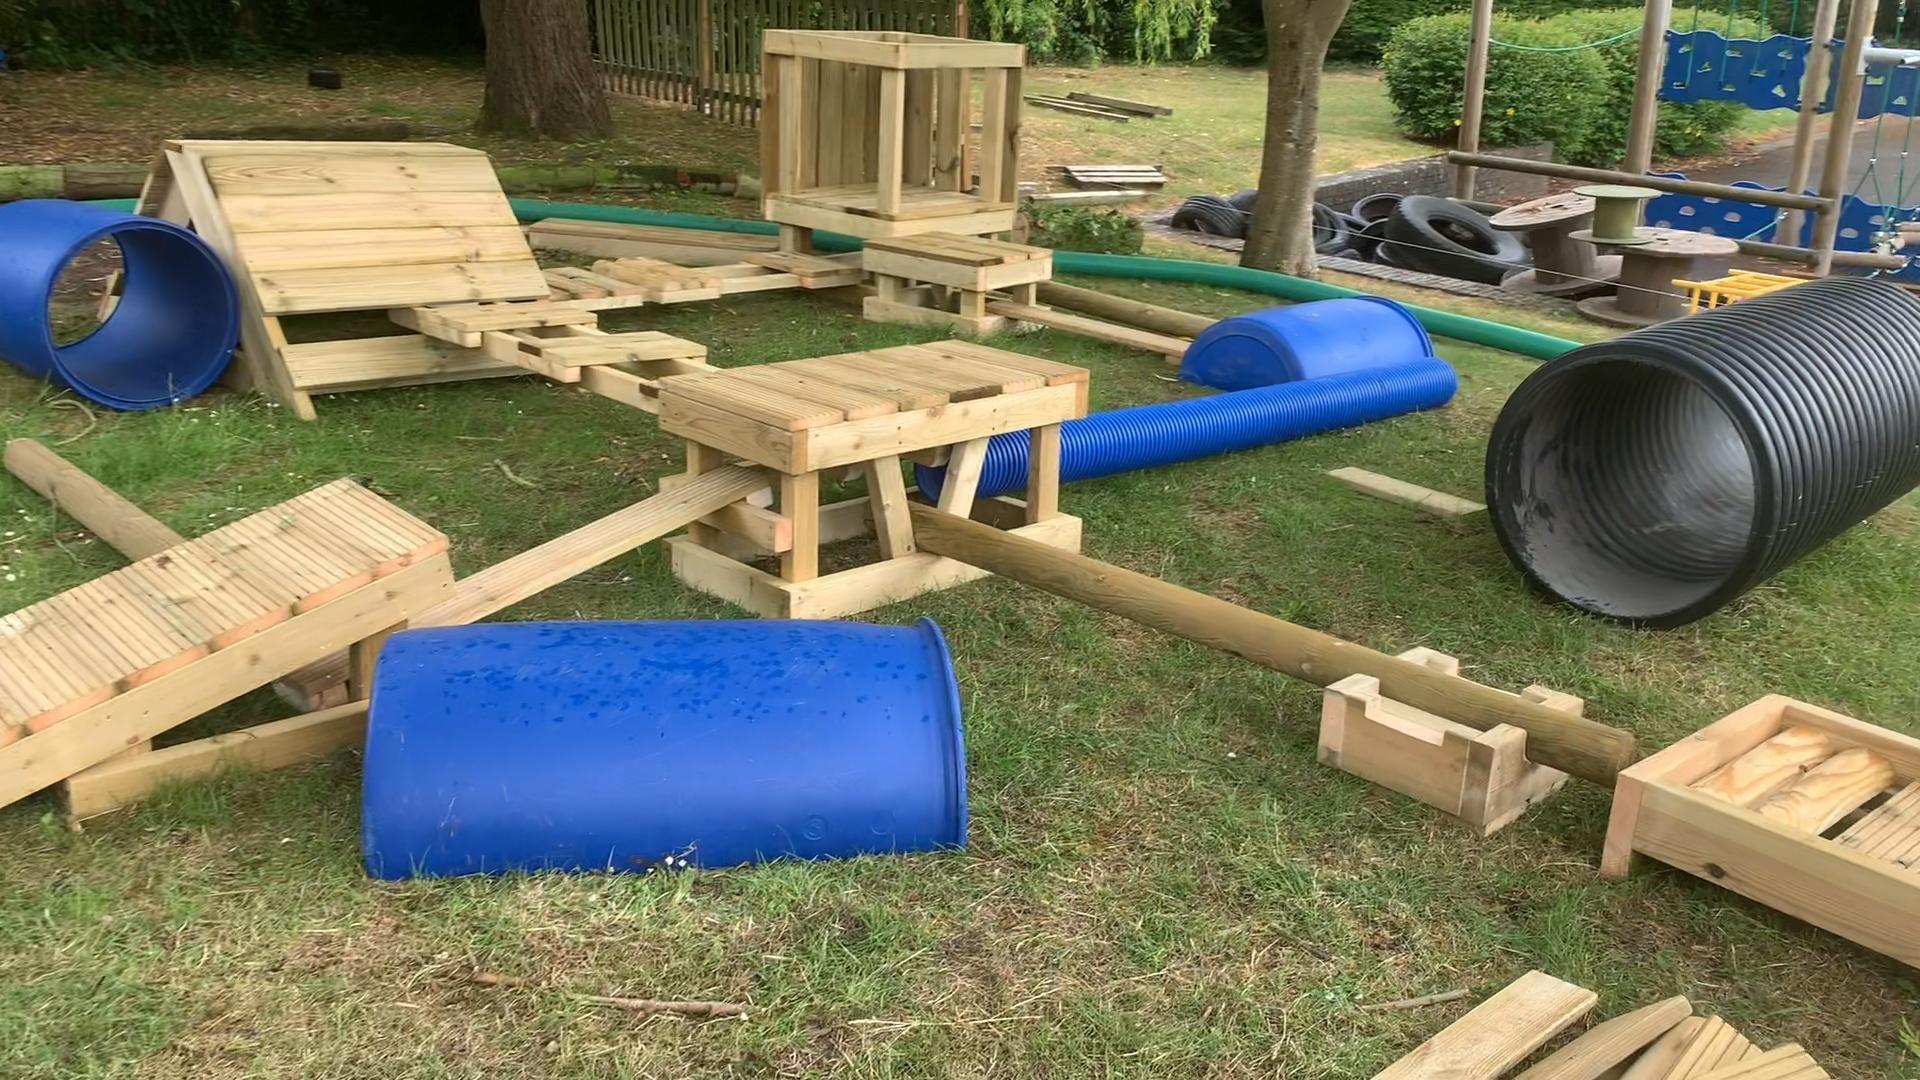 Deconstructed Play Video Backyard Dog Area Dog Playground Outdoor Play Diy backyard dog playground